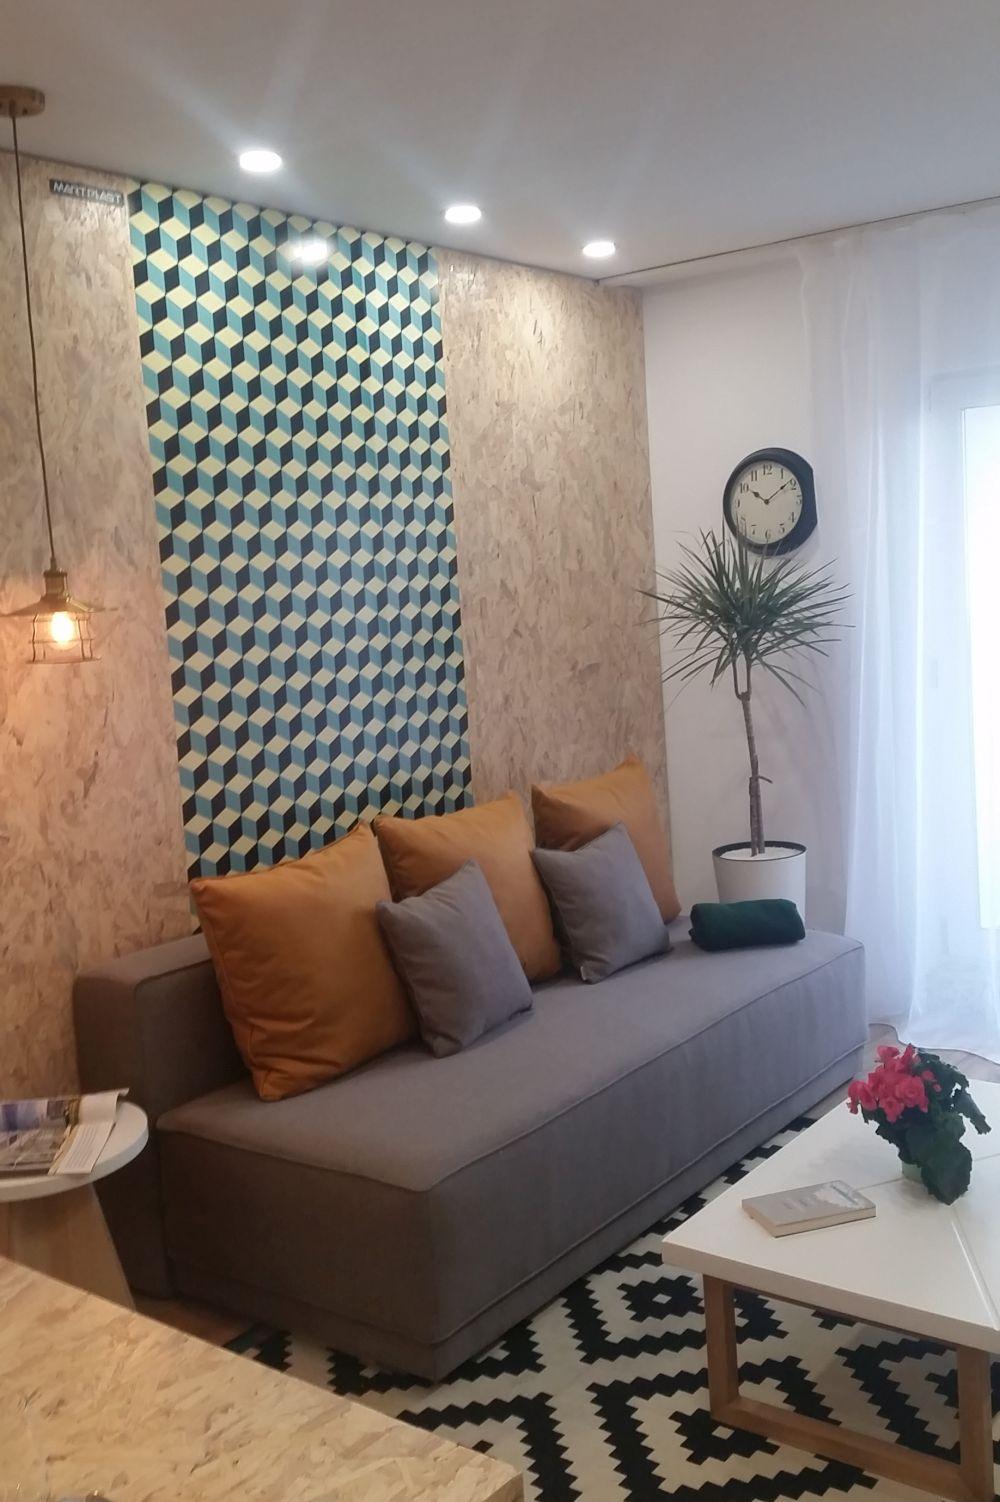 adelaparvu.com despre renovare apartament Campina, Visuri la cheie, episodul 7, sezonul 4, ProTv (1)